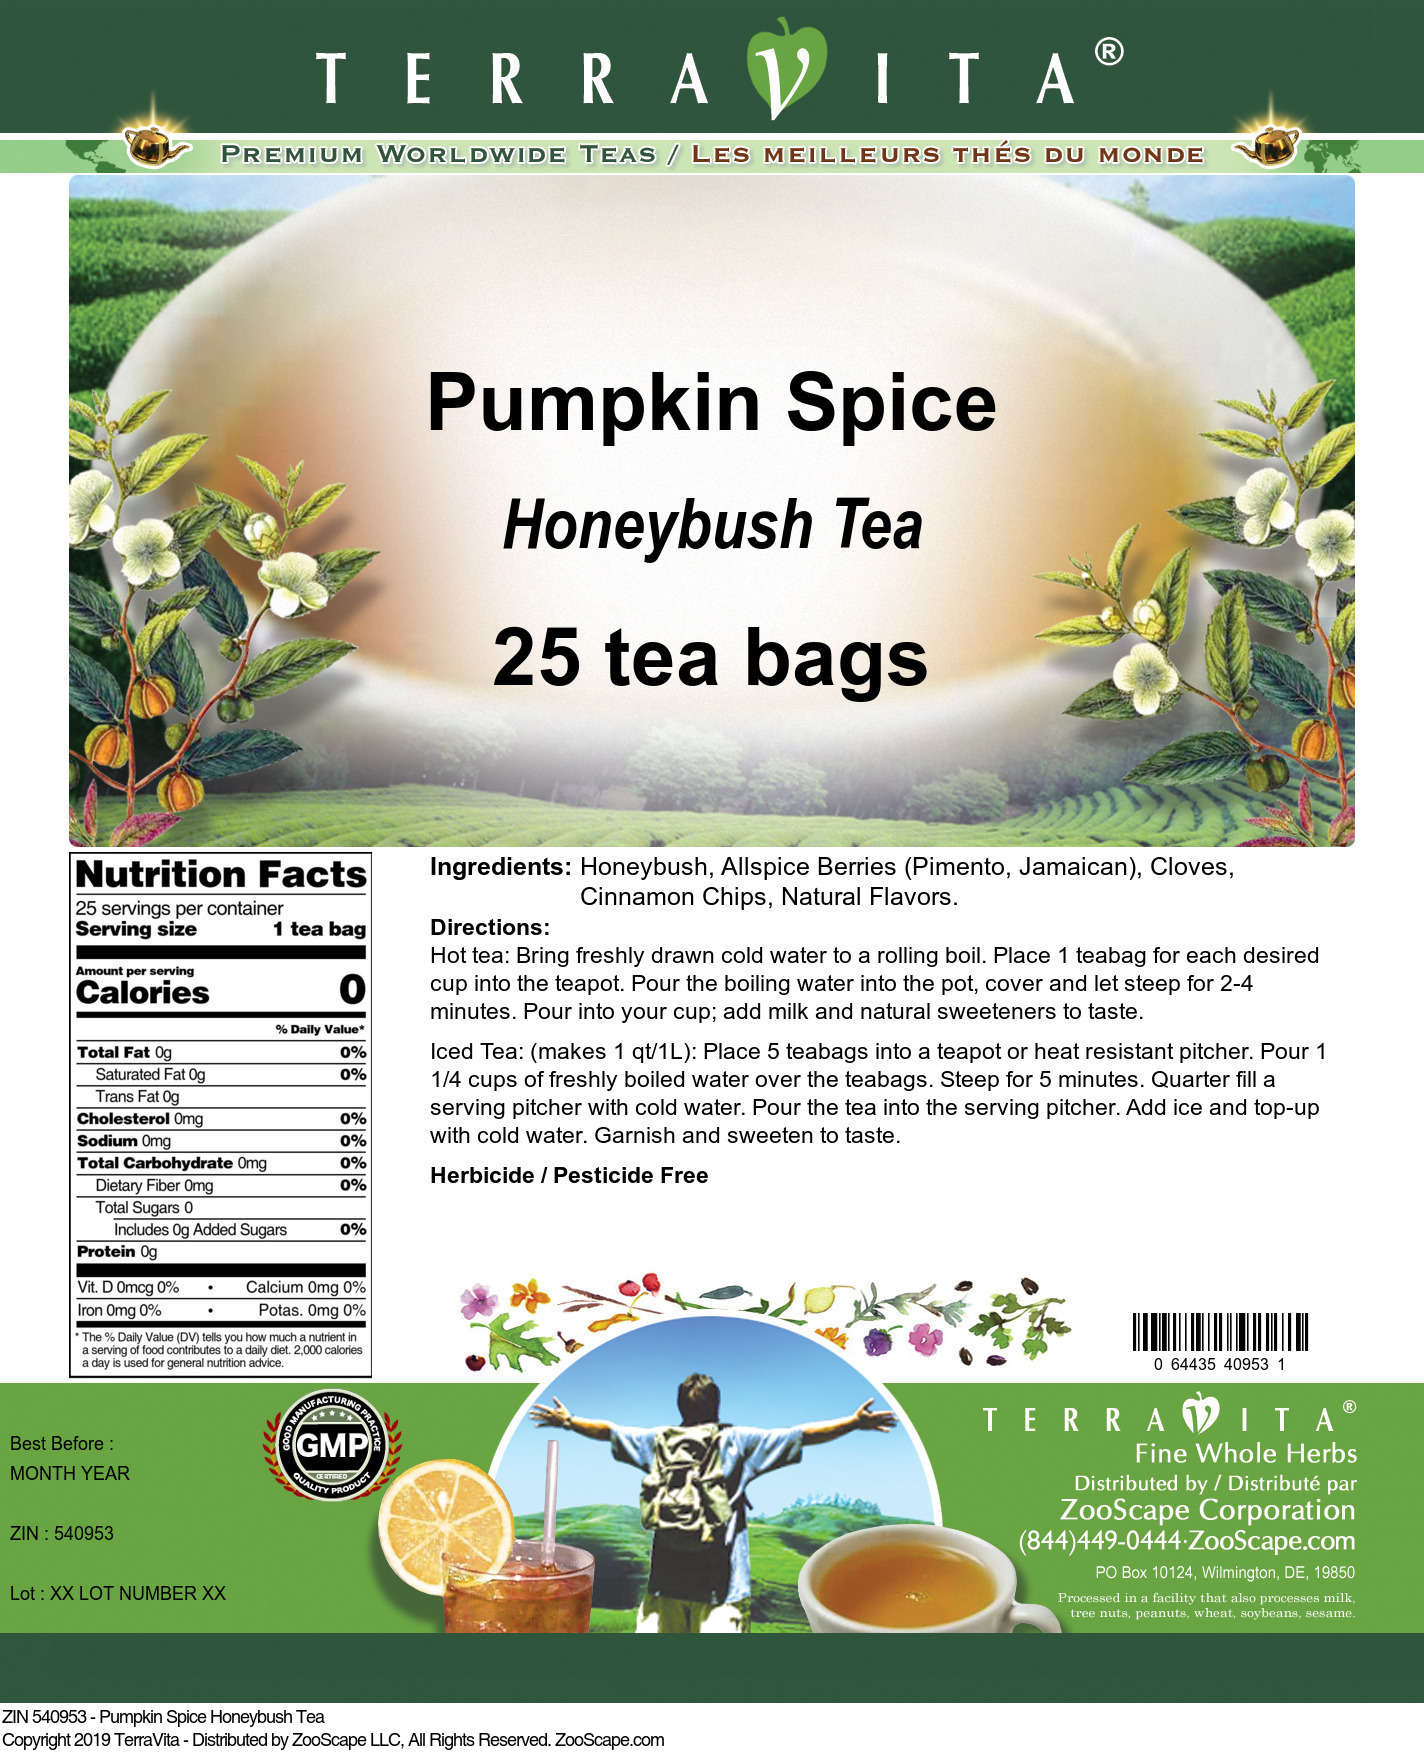 Pumpkin Spice Honeybush Tea